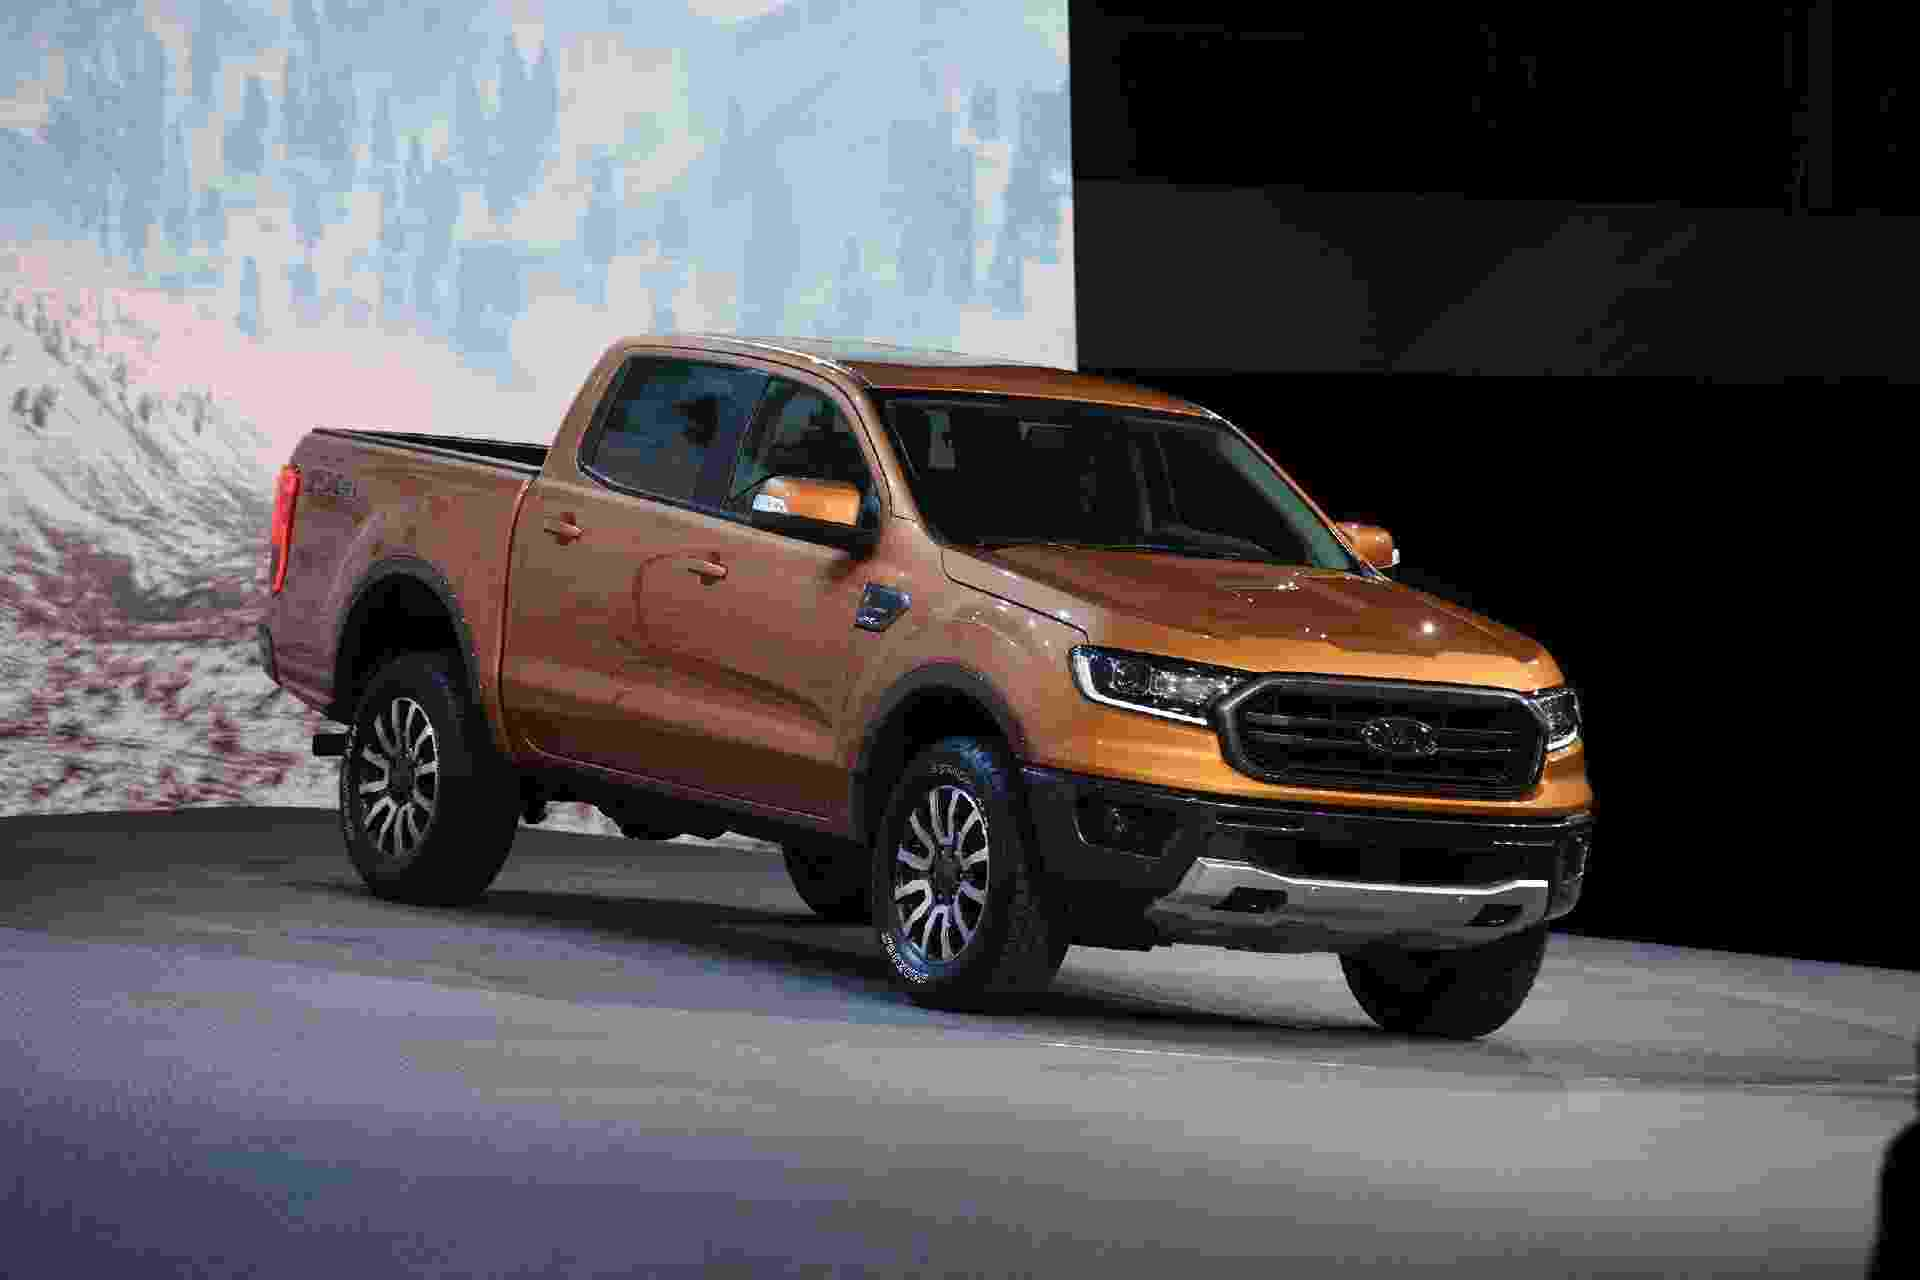 Ford Ranger 2019 americana - Murilo Góes/UOL